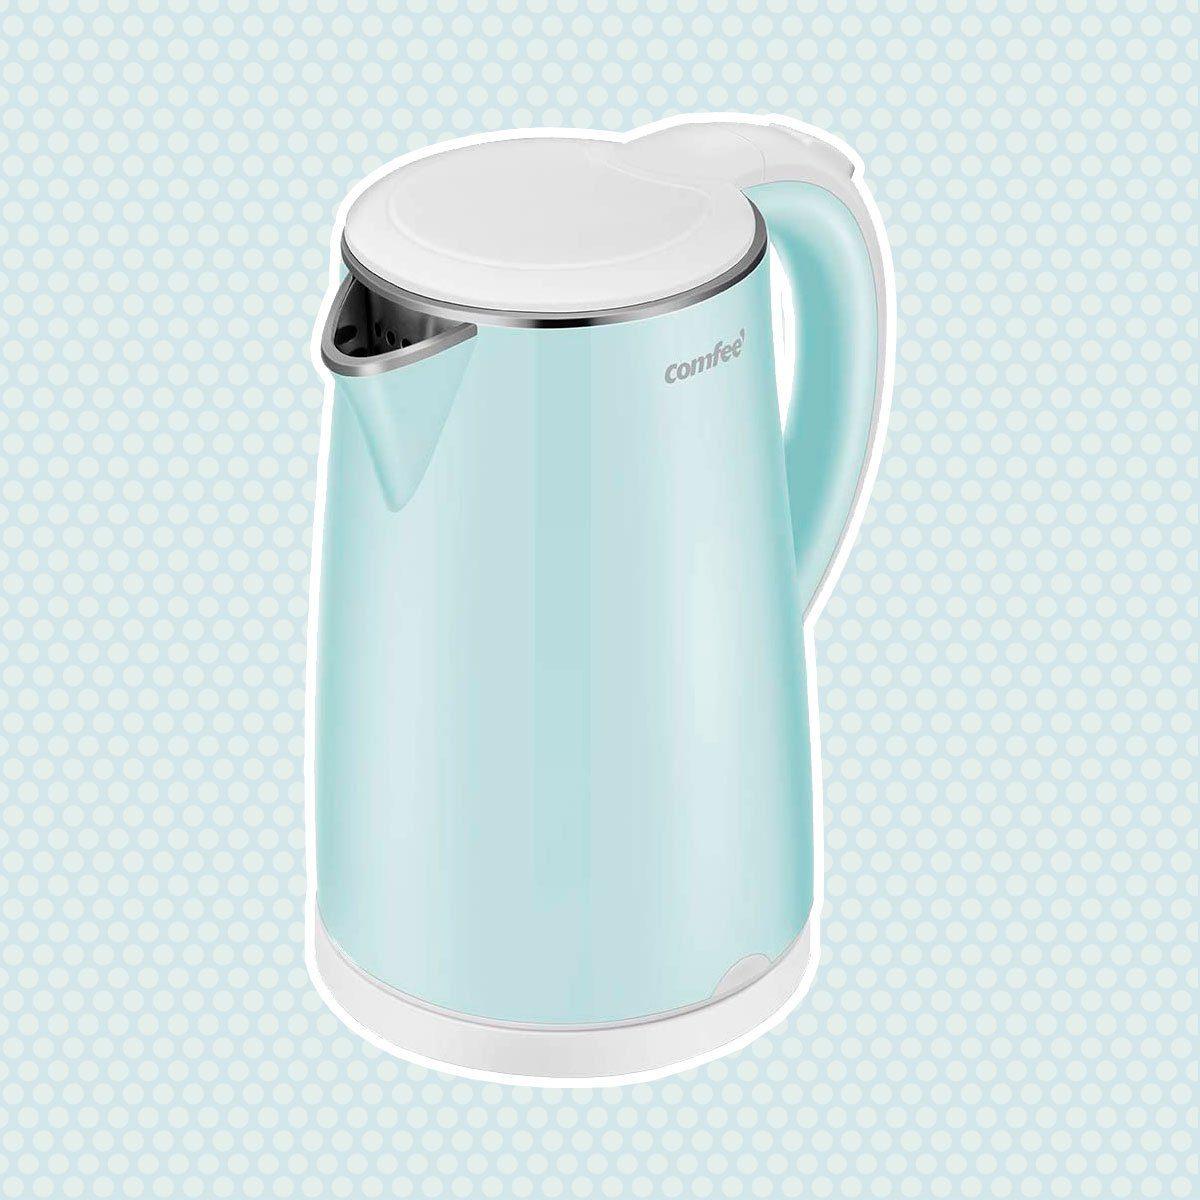 comfee electric kettle